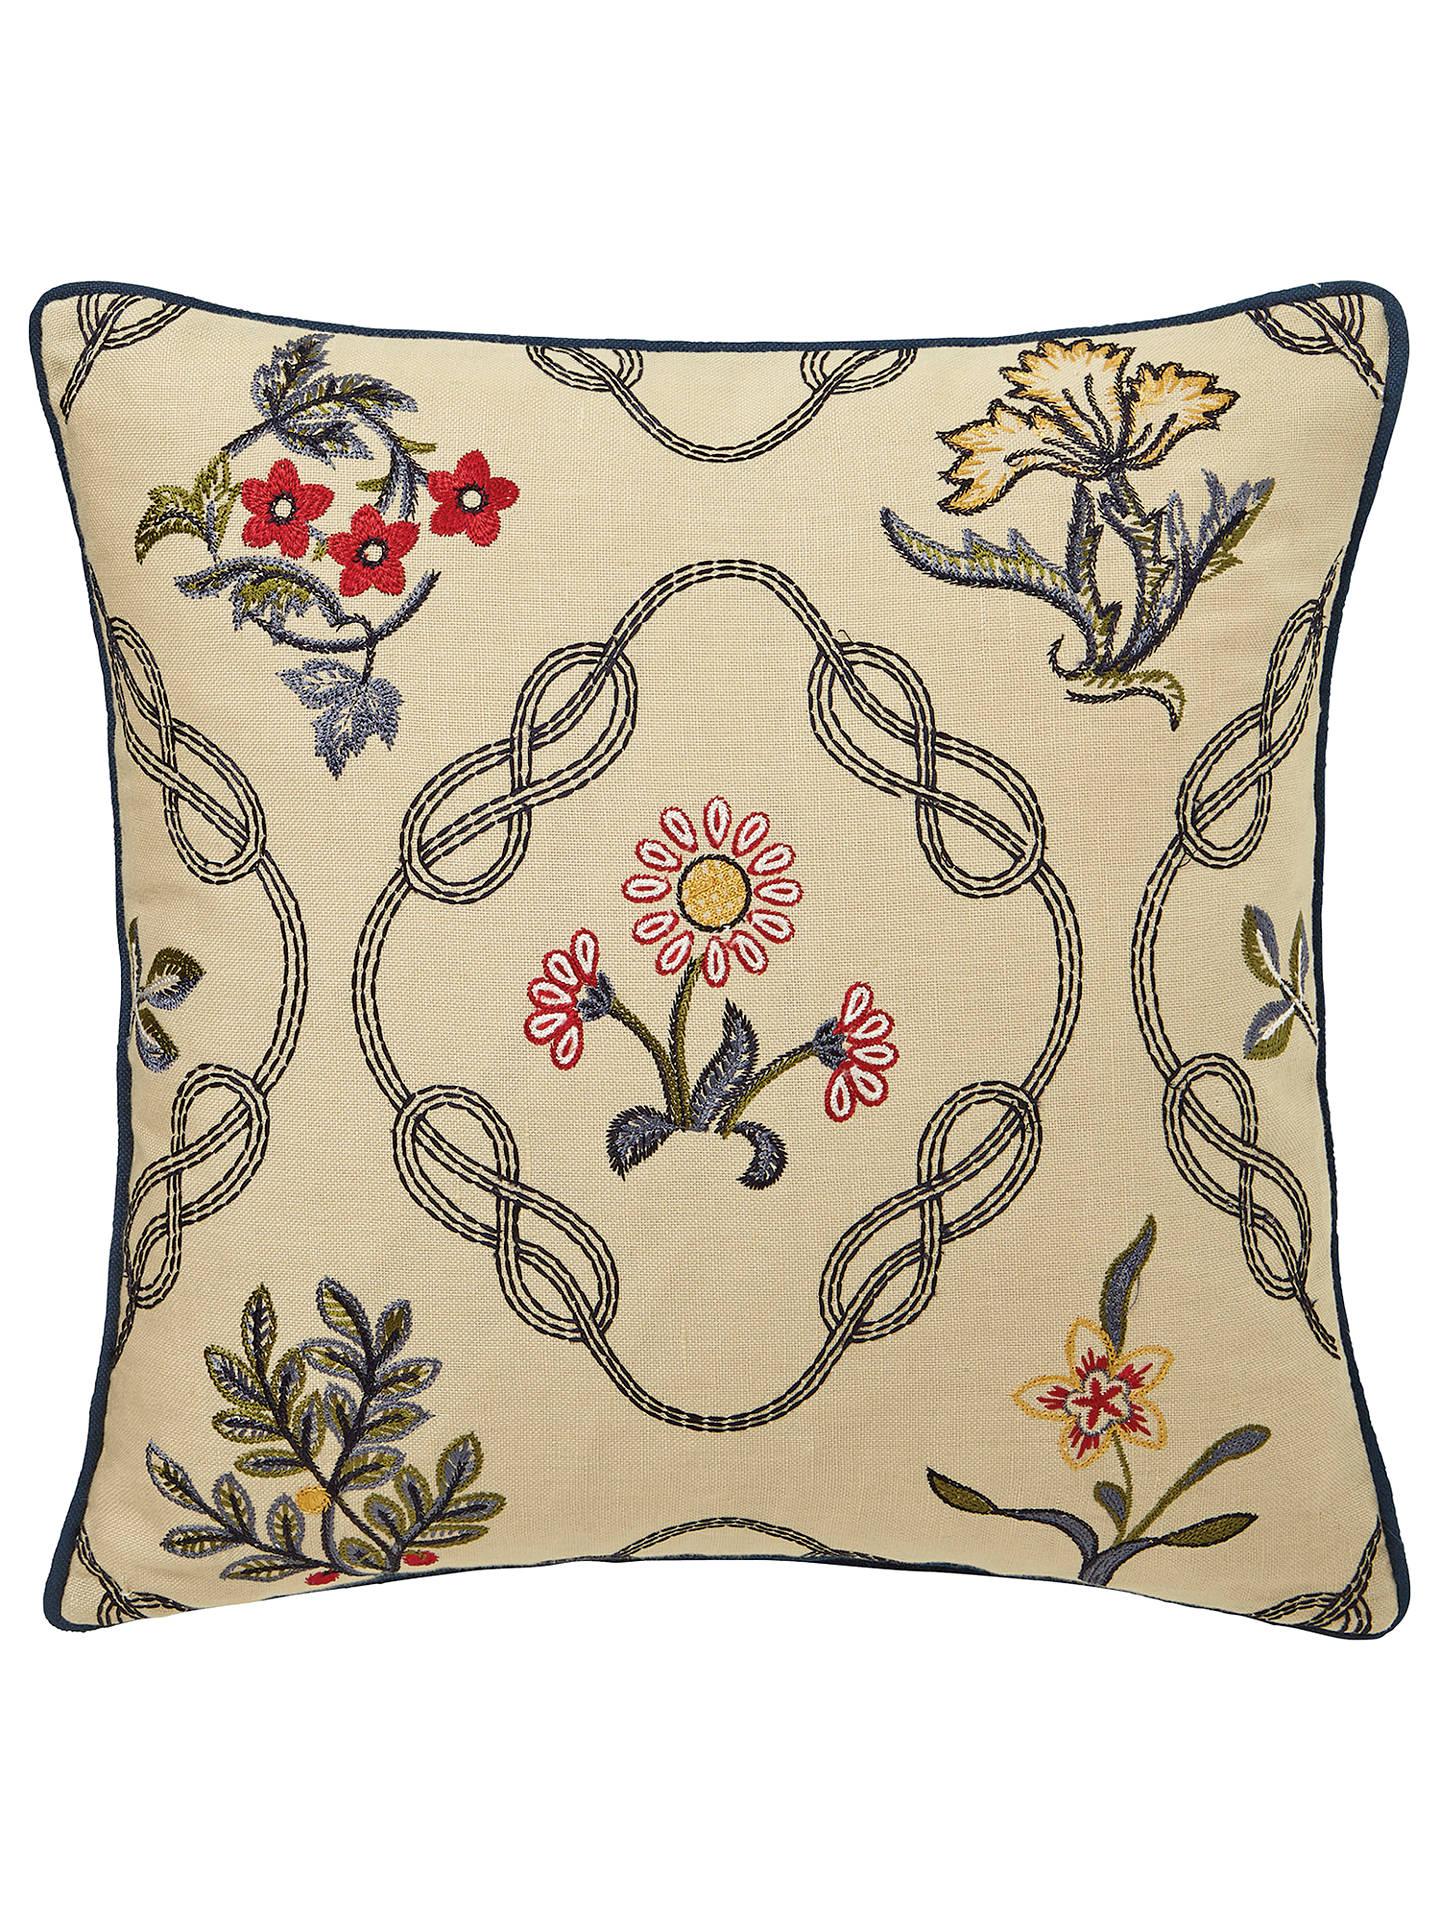 a333772b5d60 Morris   Co. Strawberry Thief Embroidered Cotton Cushion at John ...